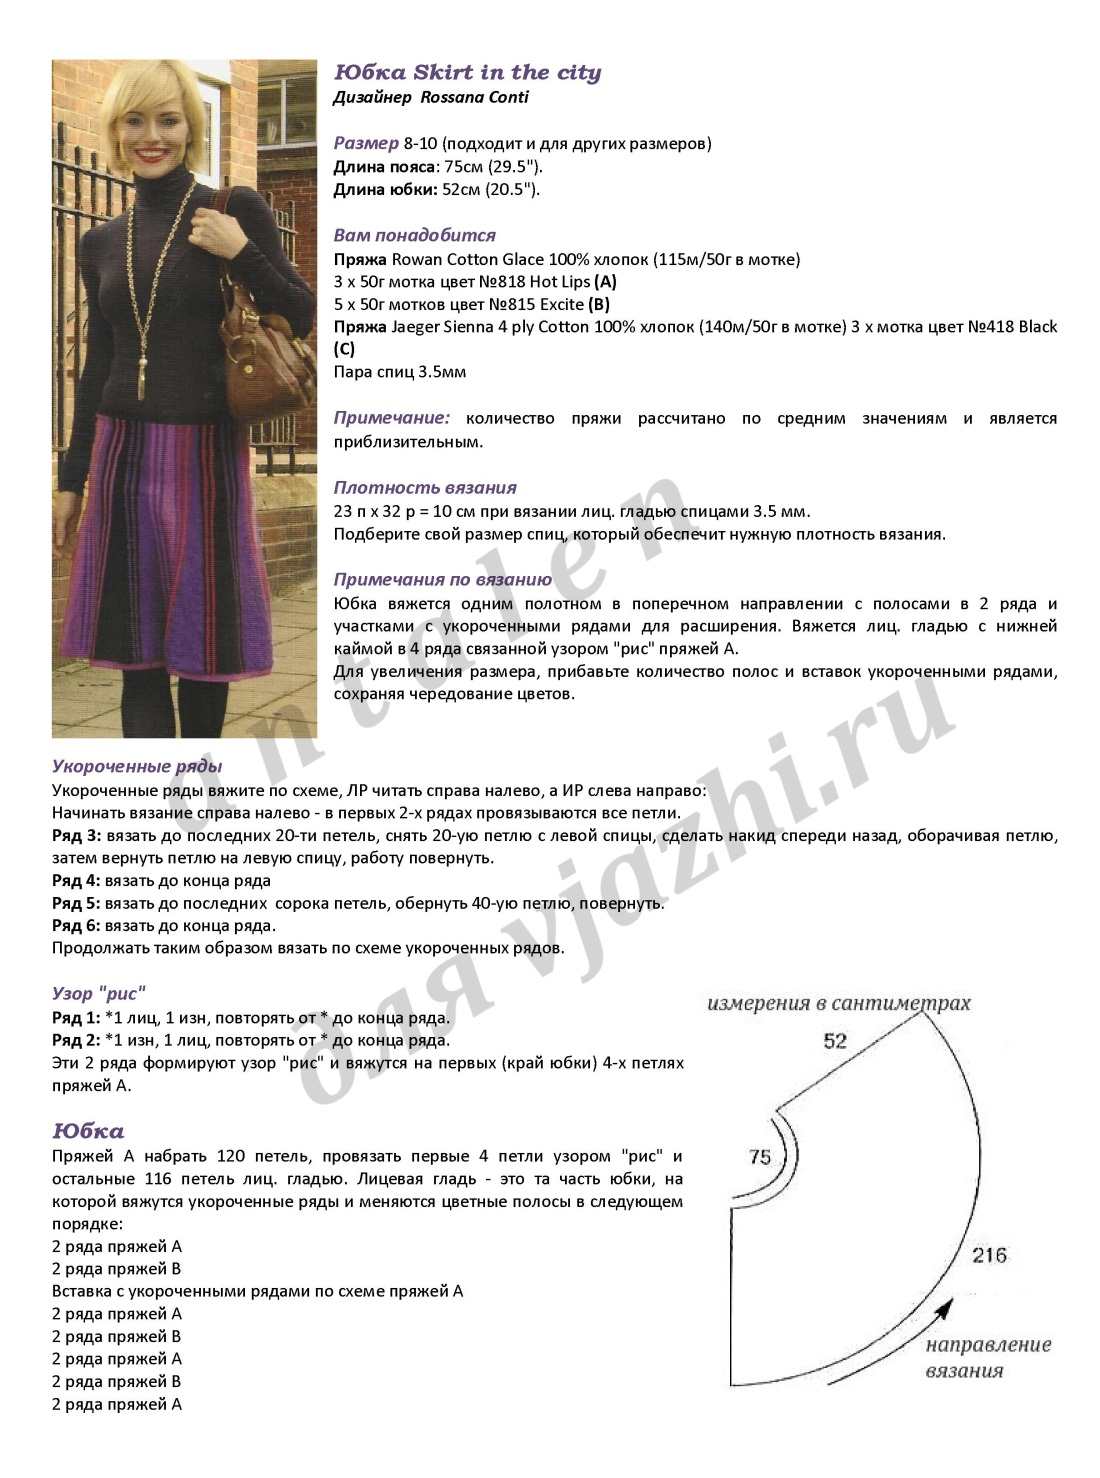 Юбки - Вязание крючком и спицами 53